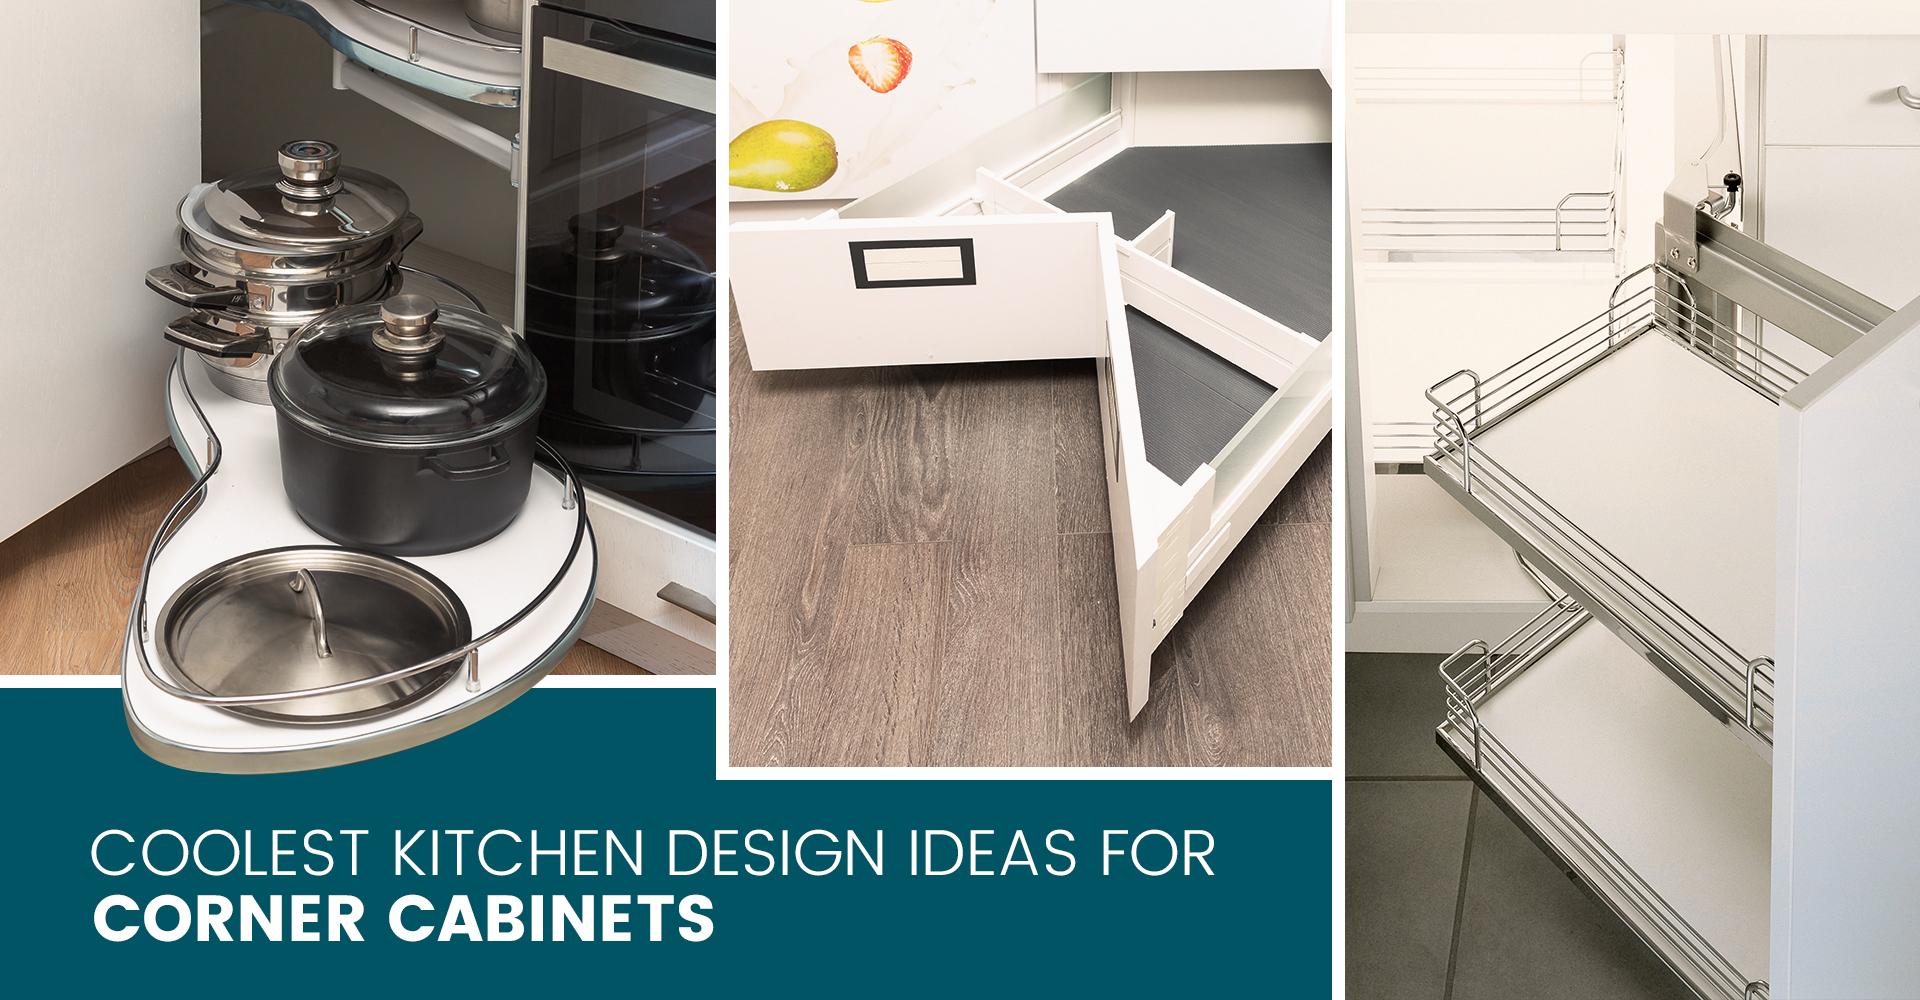 Coolest Kitchen Design Ideas For Corner Cabinets